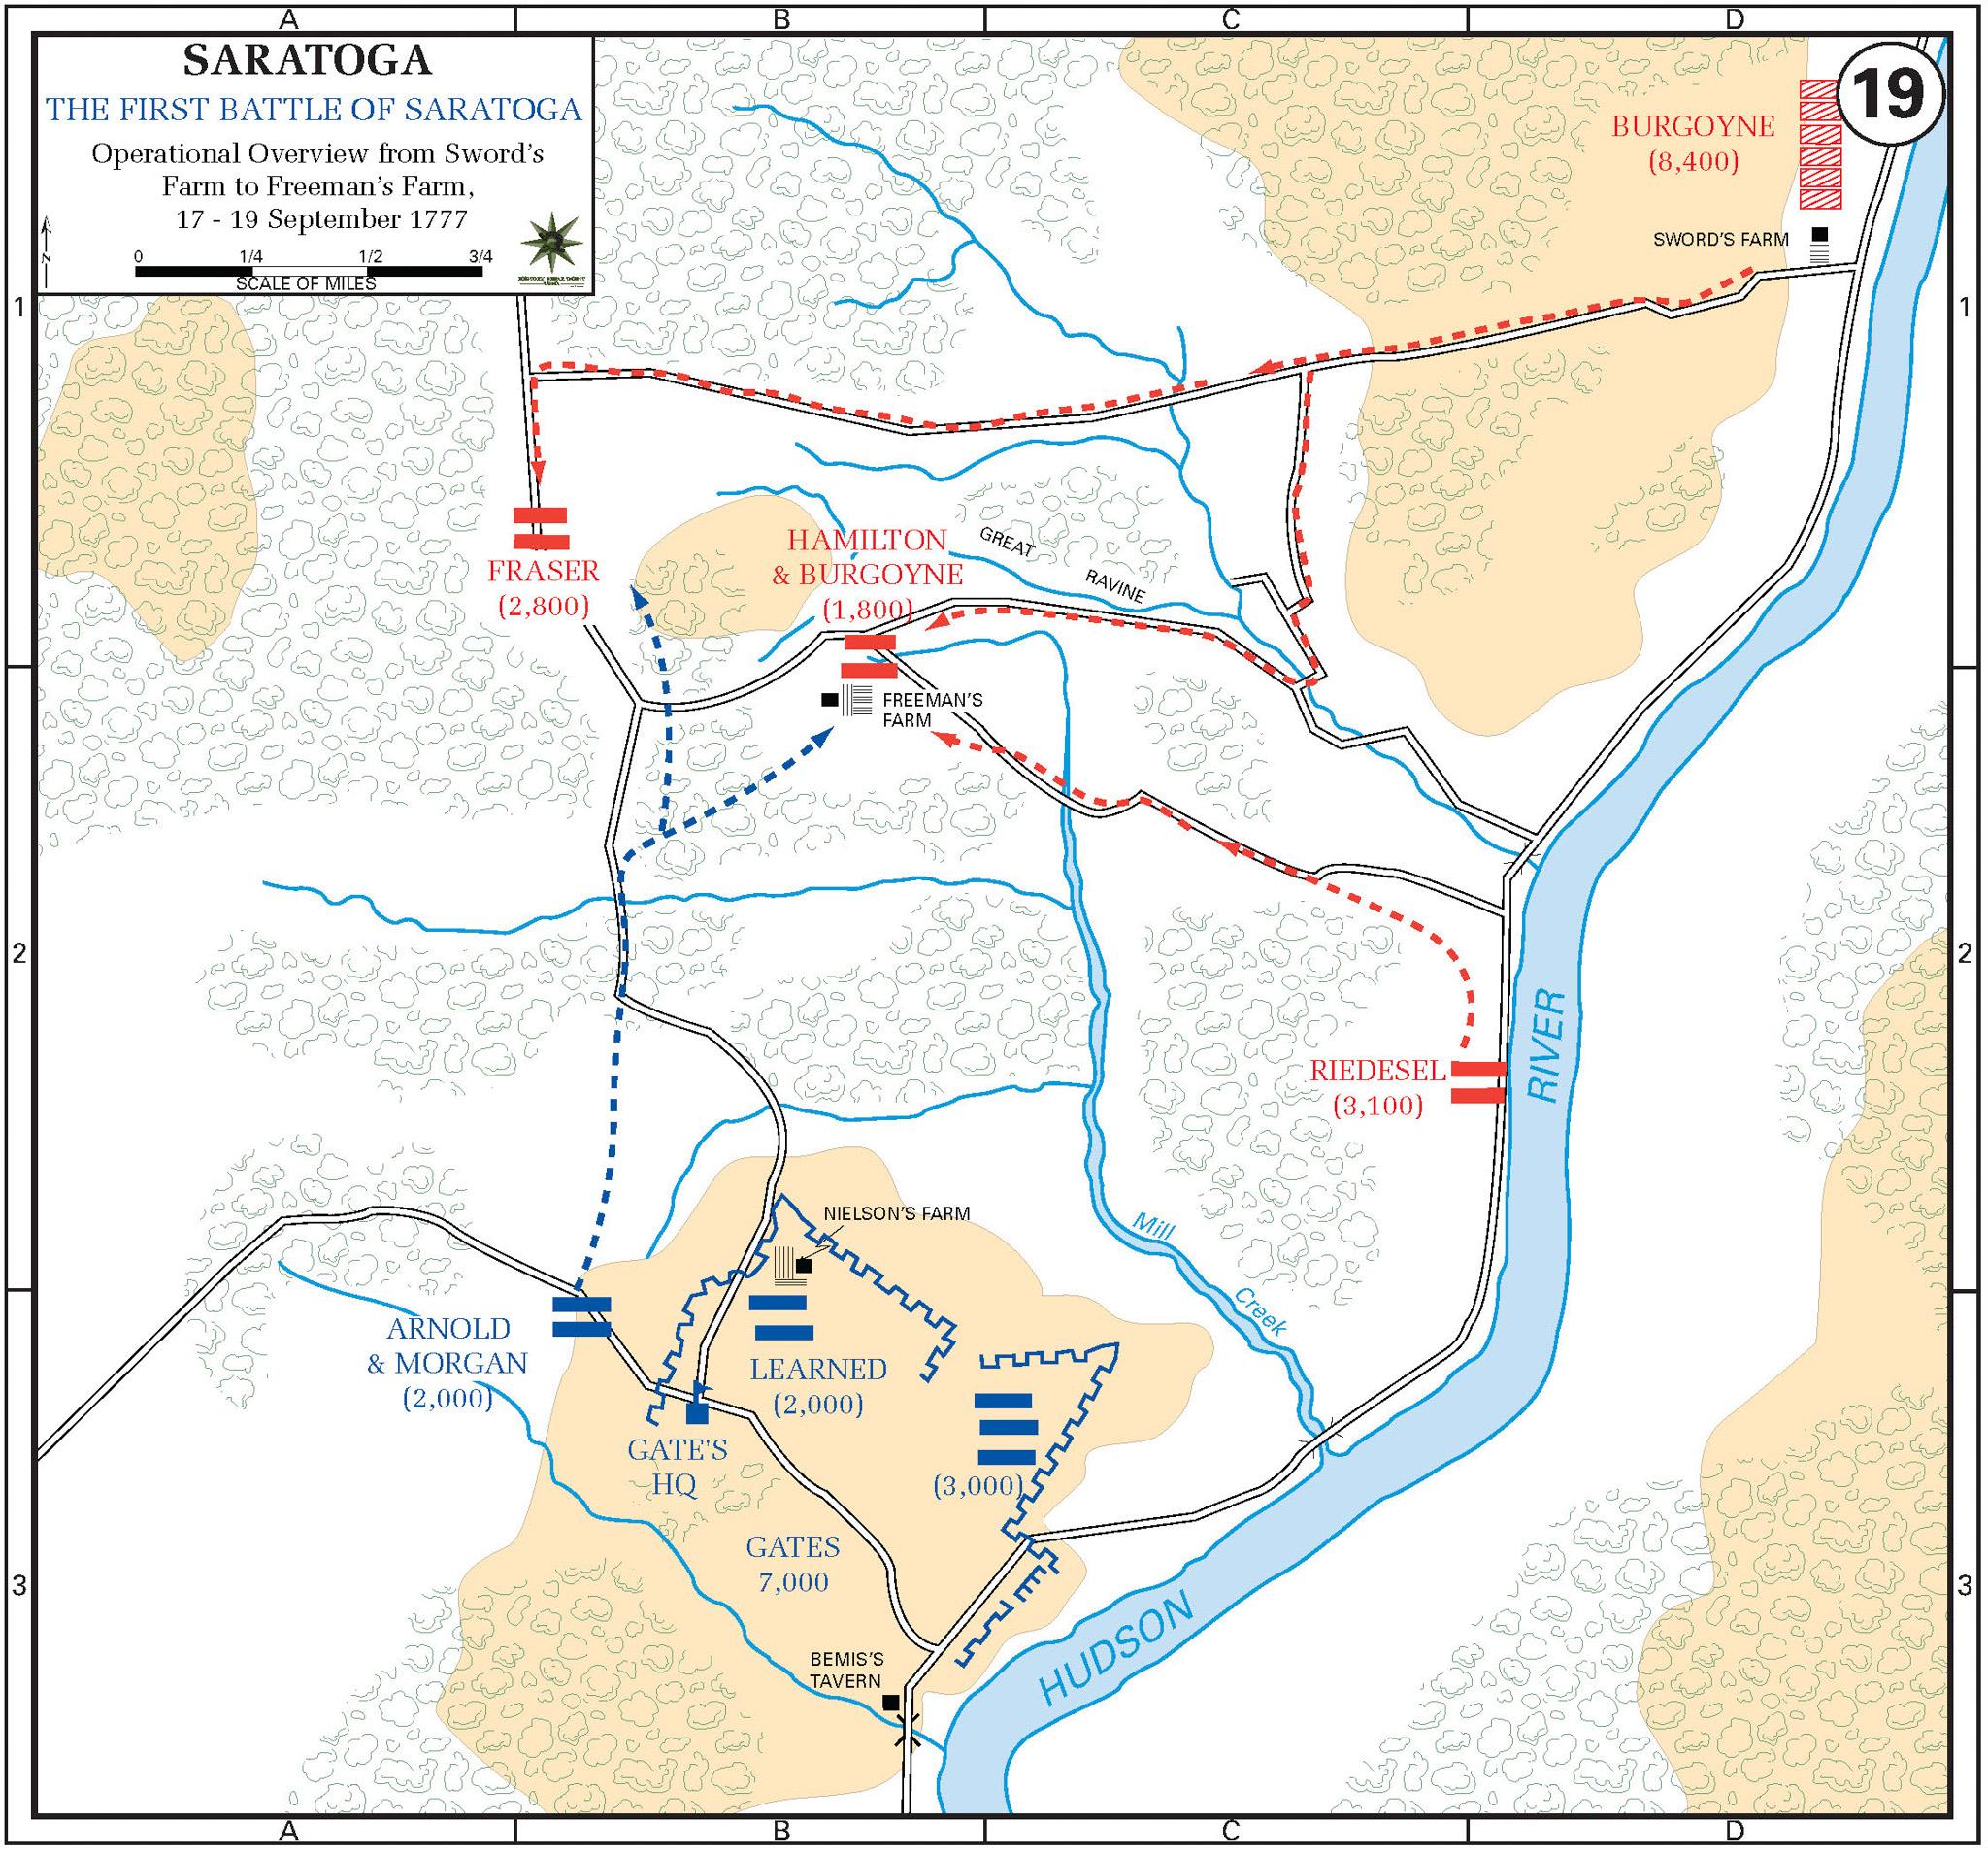 Map of 1st Battle of Saratoga